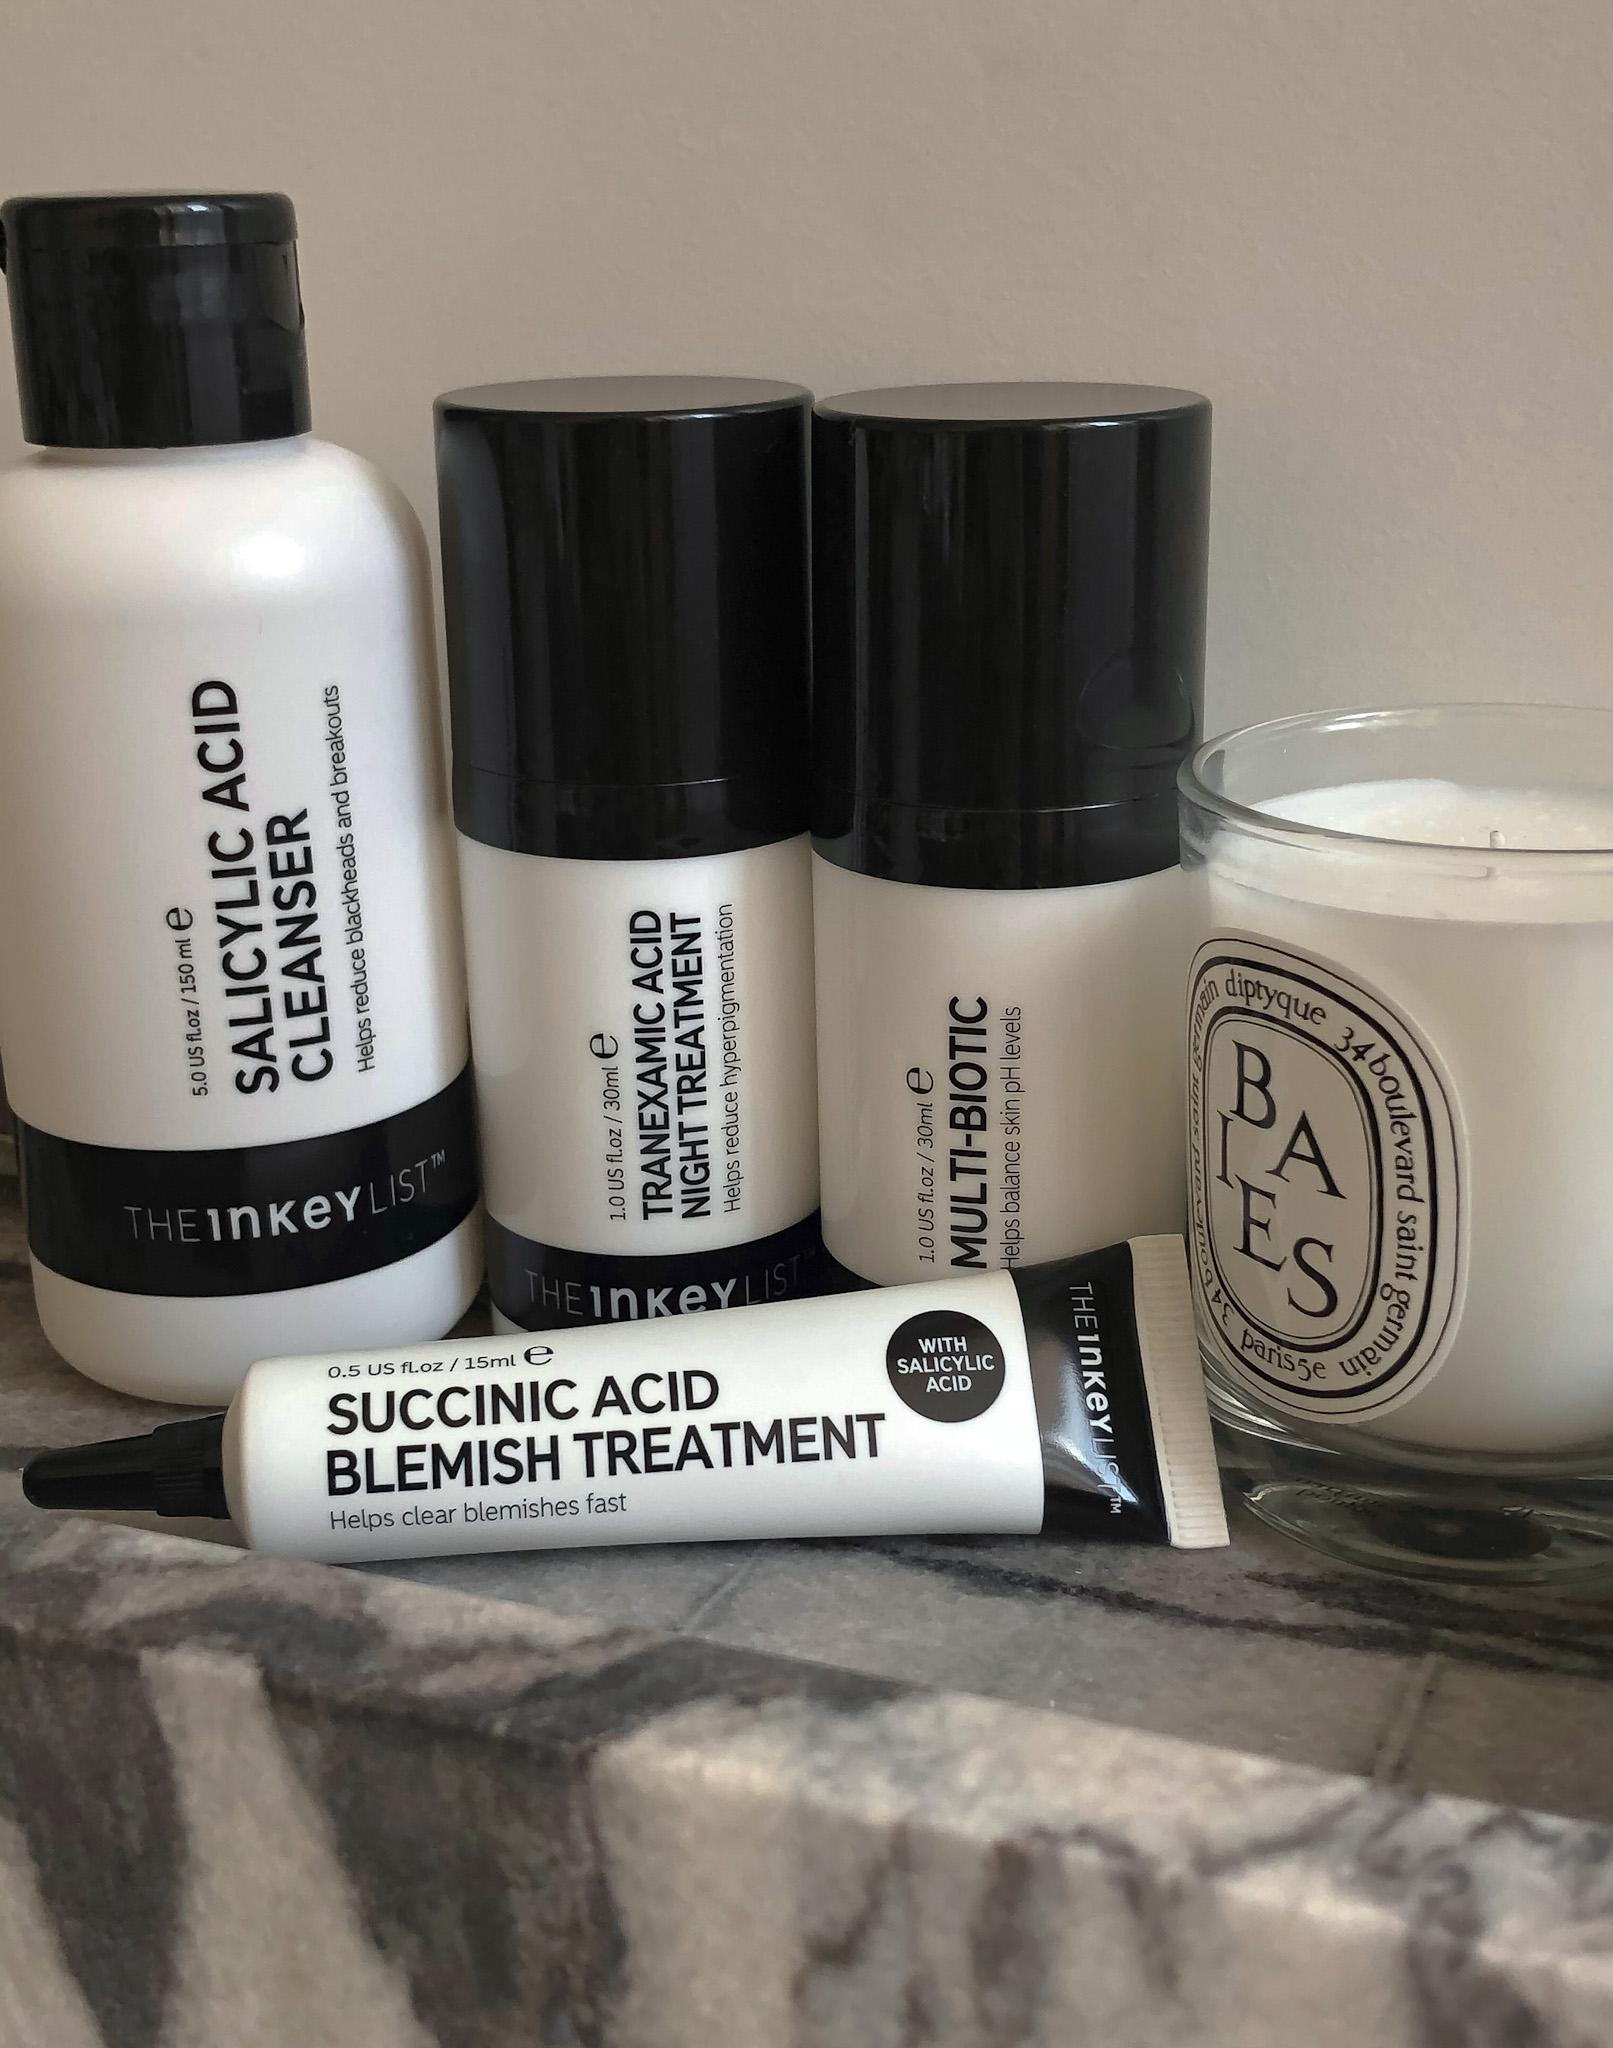 The Inkey List Succinic Acid Blemish Treatment_Recenzija